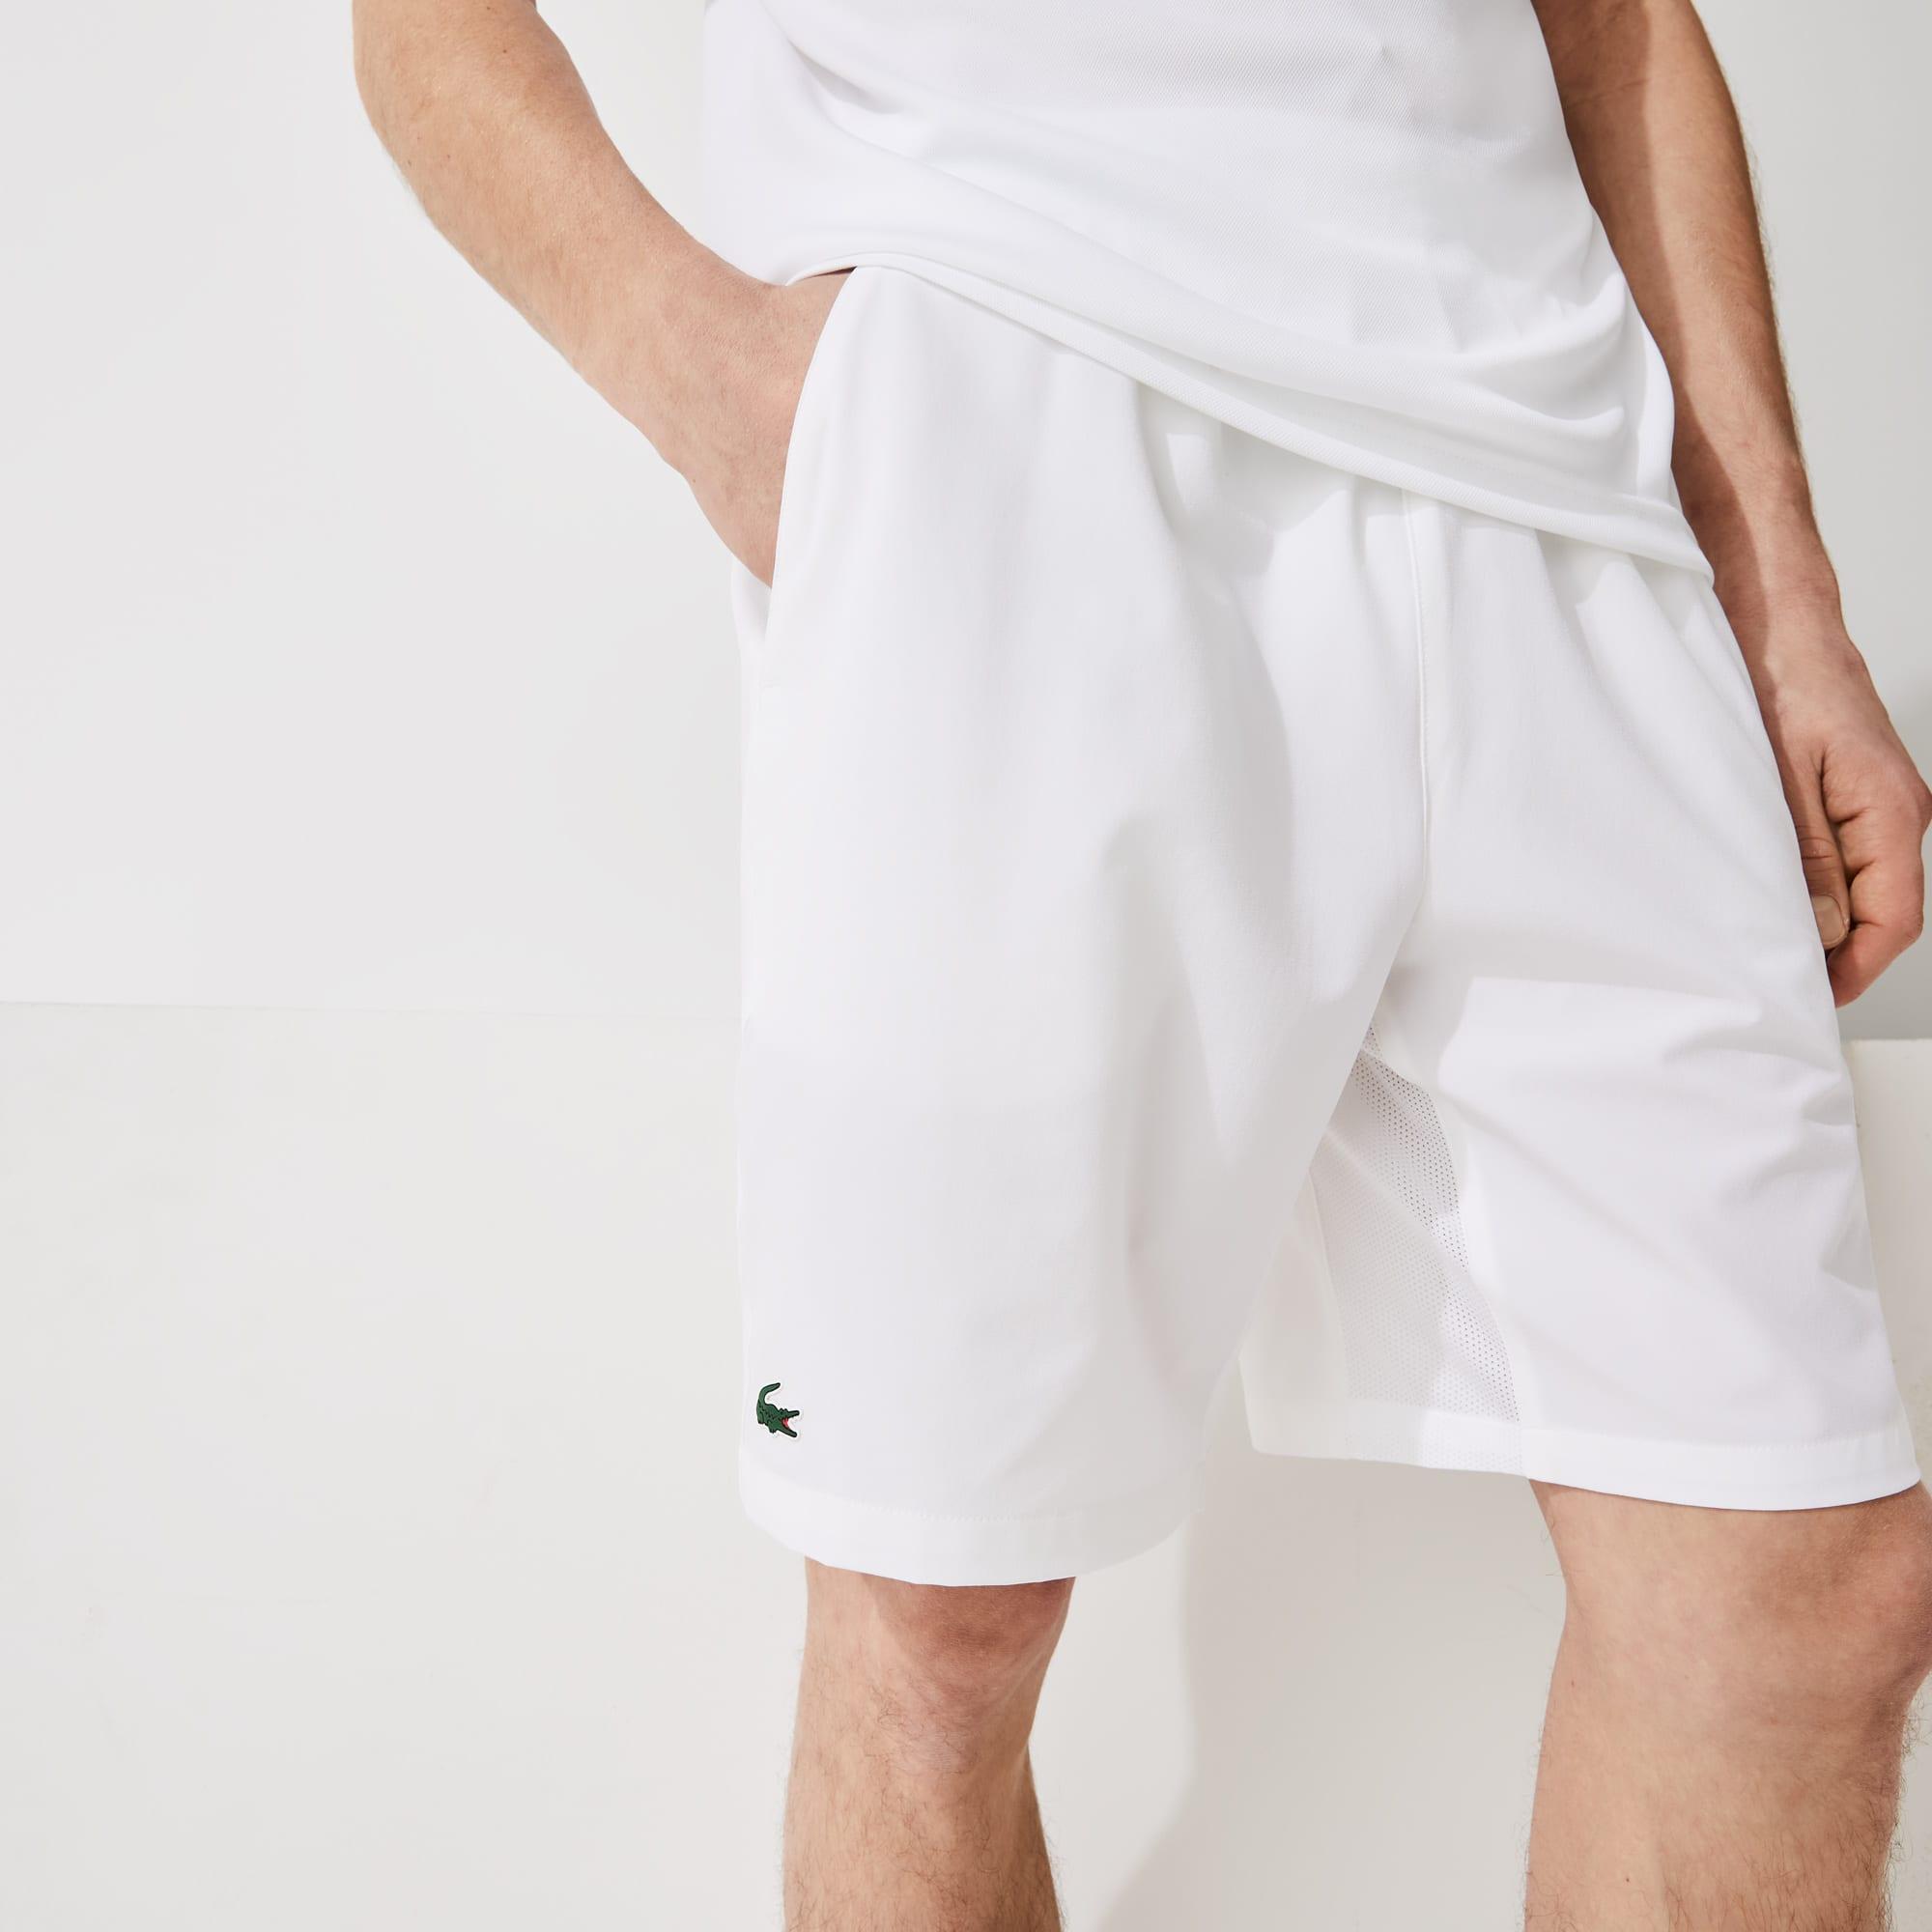 b7201d45 Men's SPORT Tennis Stretch Shorts